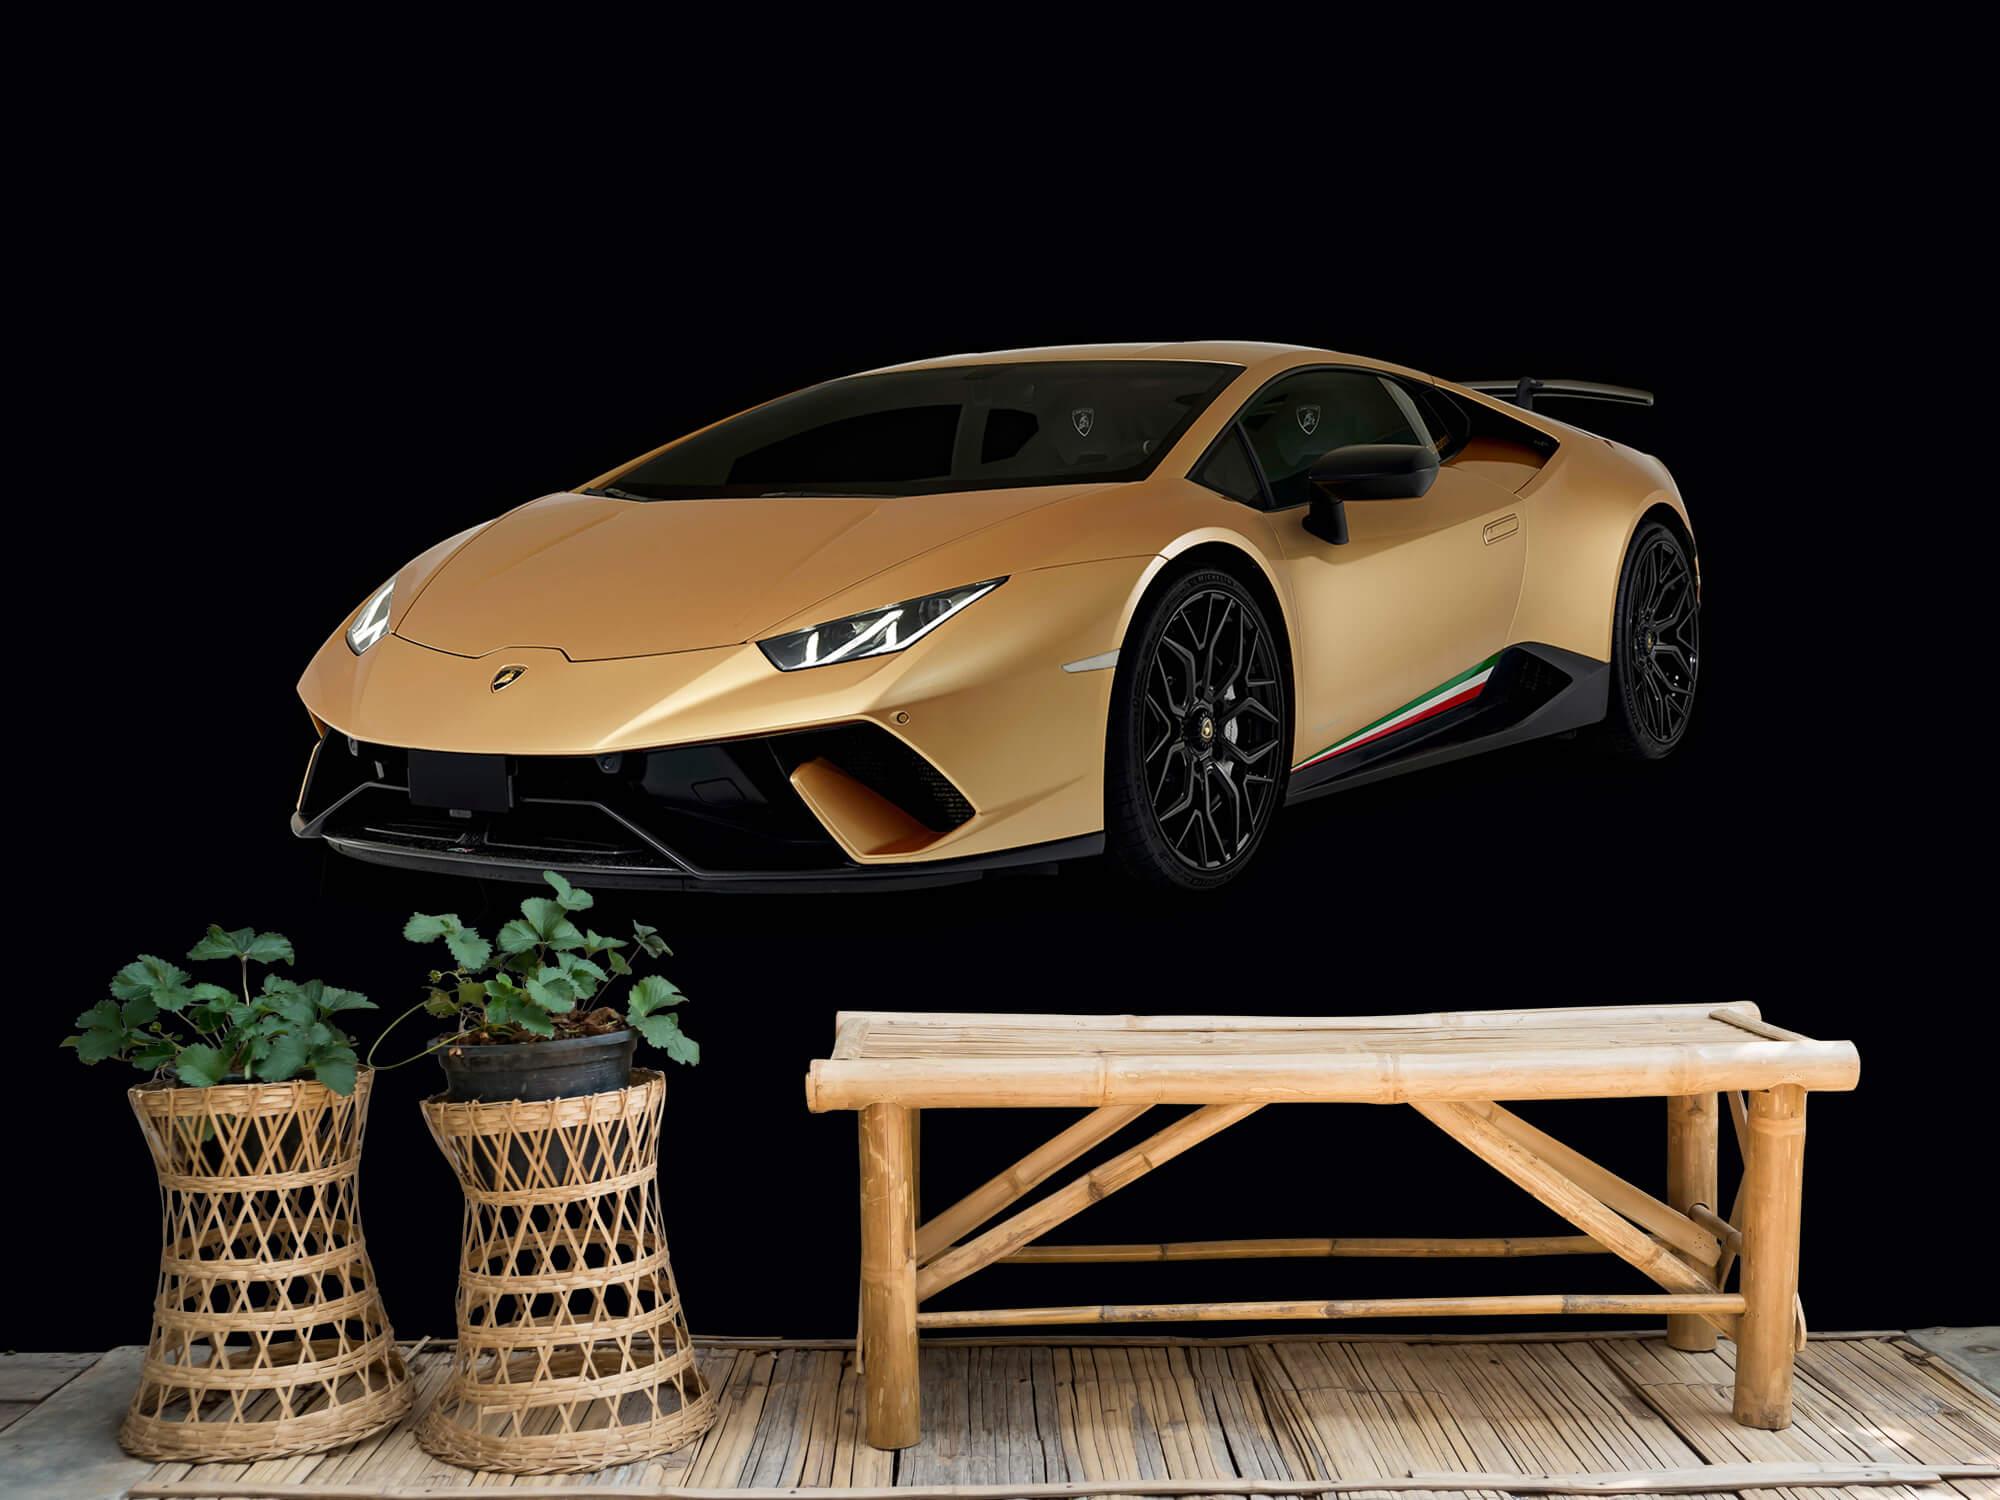 Wallpaper Lamborghini Huracán - Rechter voorkant, zwart 6